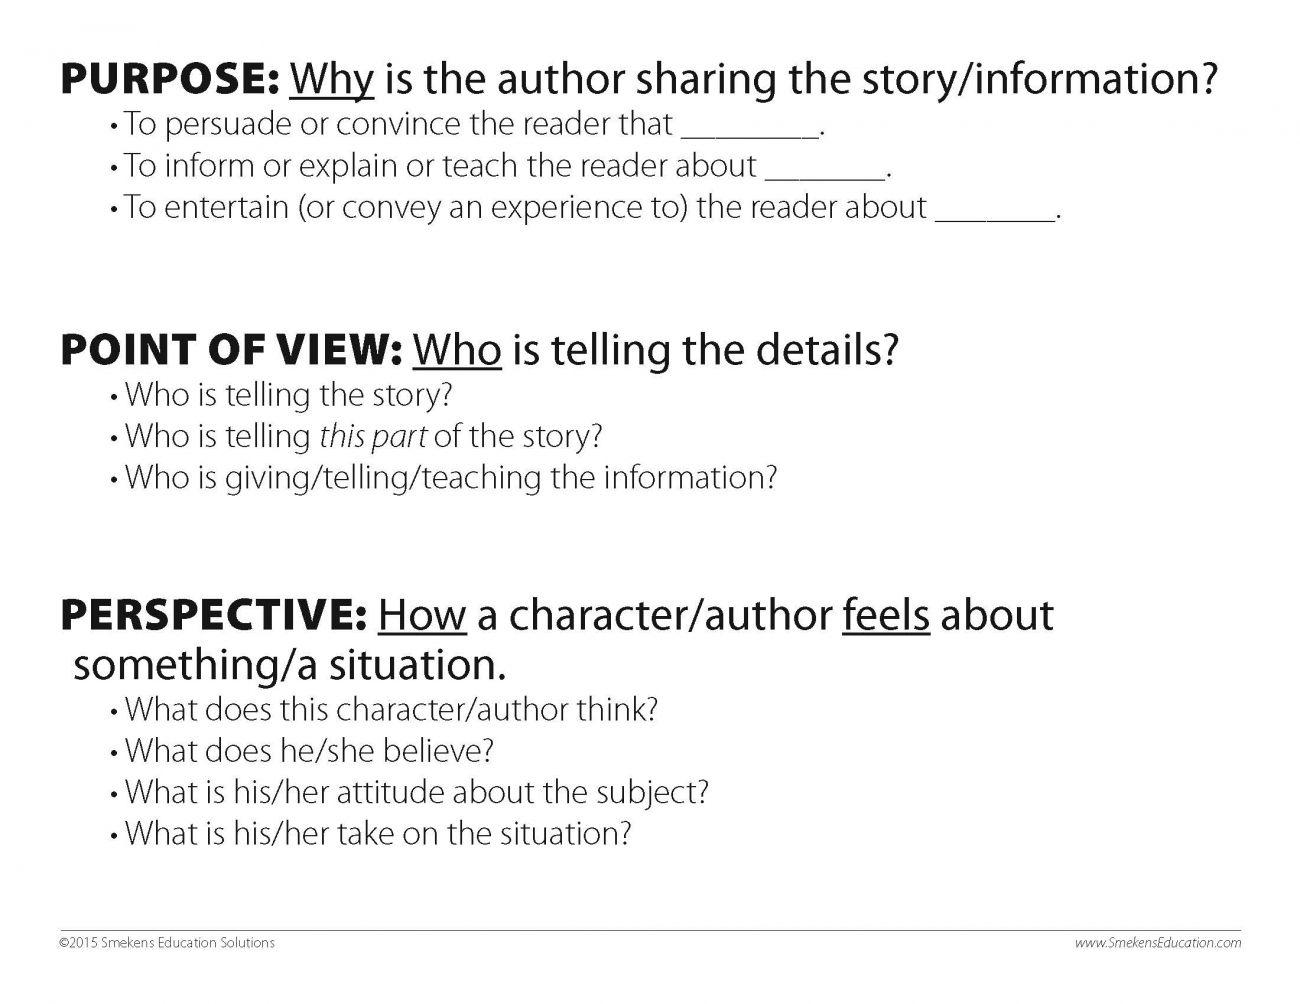 hight resolution of 6 Traits of Writing – Professional Development - Clarify \u003cI\u003ePurpose\u003c/I\u003e  versus \u003cI\u003ePoint of View\u003c…   Authors perspective